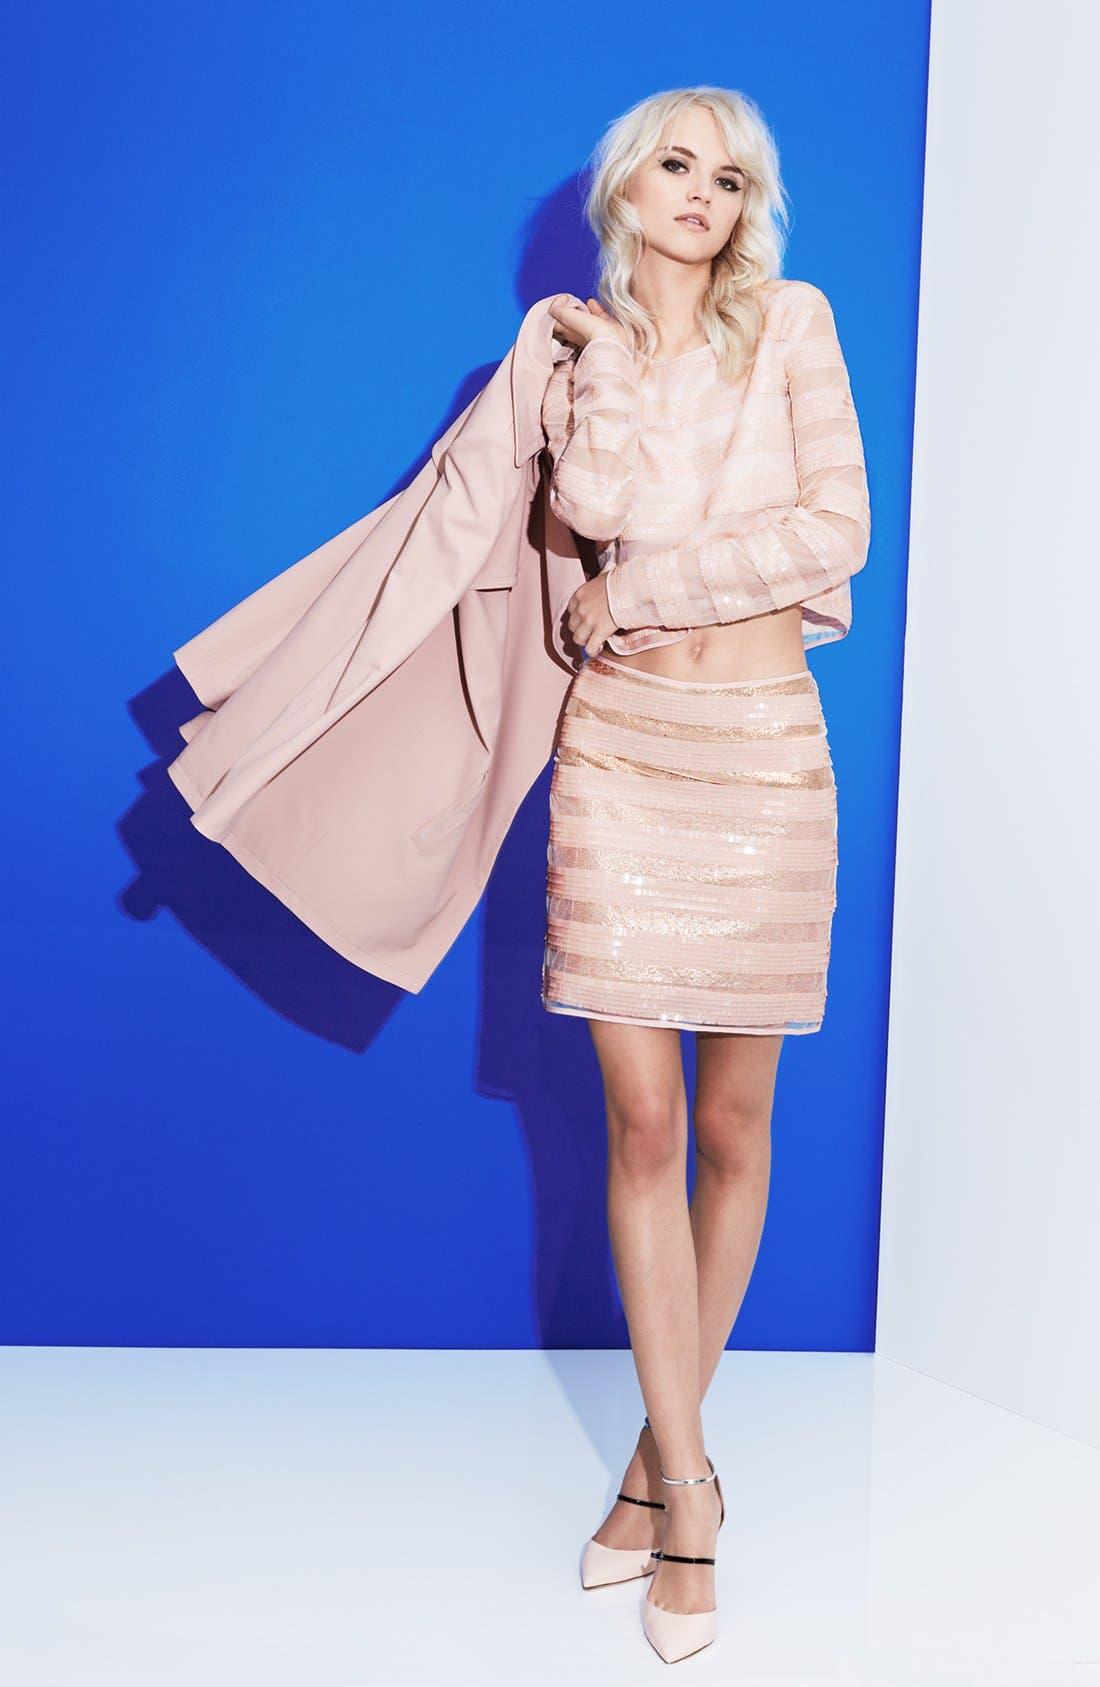 Main Image - Mural Trench Coat, MINKPINK Top & Skirt